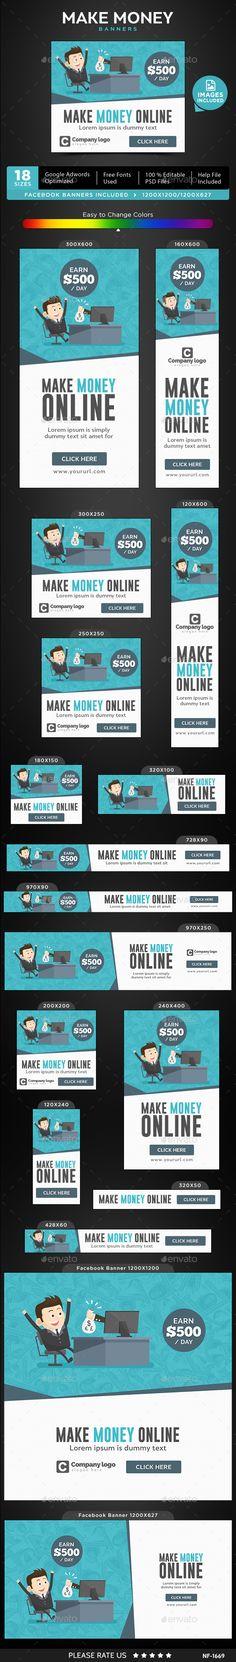 Make Money Banners Template PSD #ads